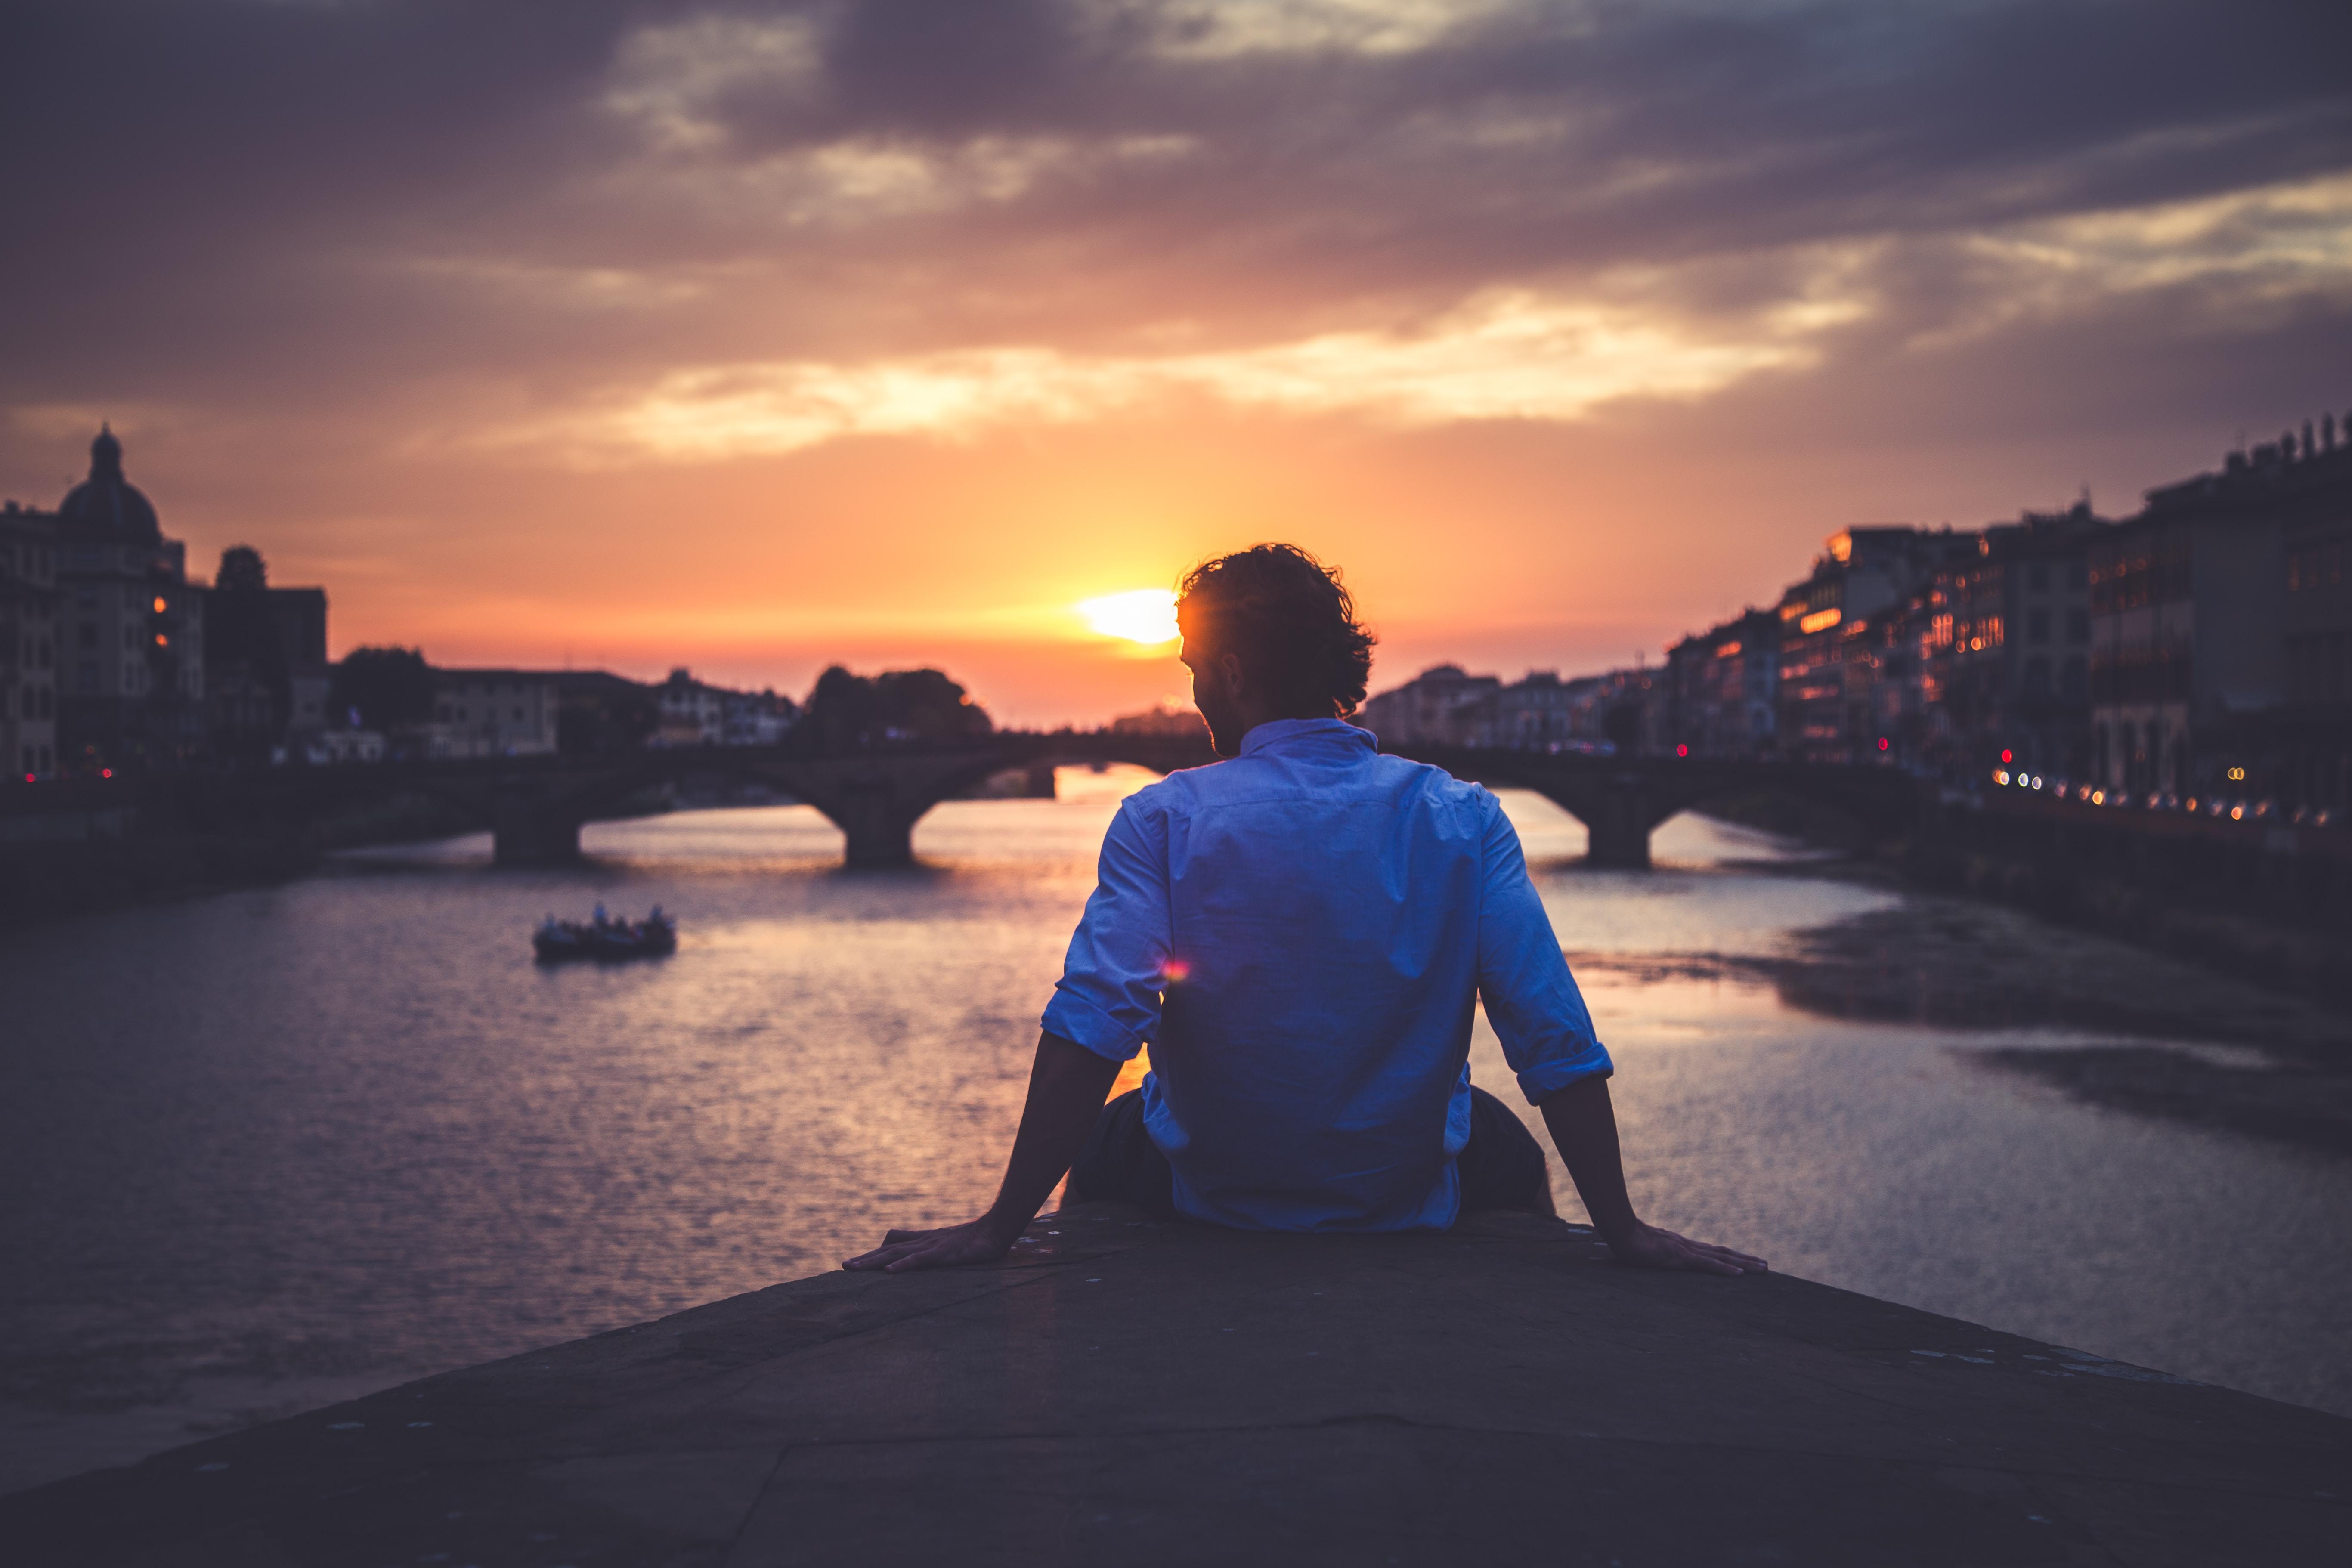 man wearing dress shirt sitting on dock near body of water during golden hour